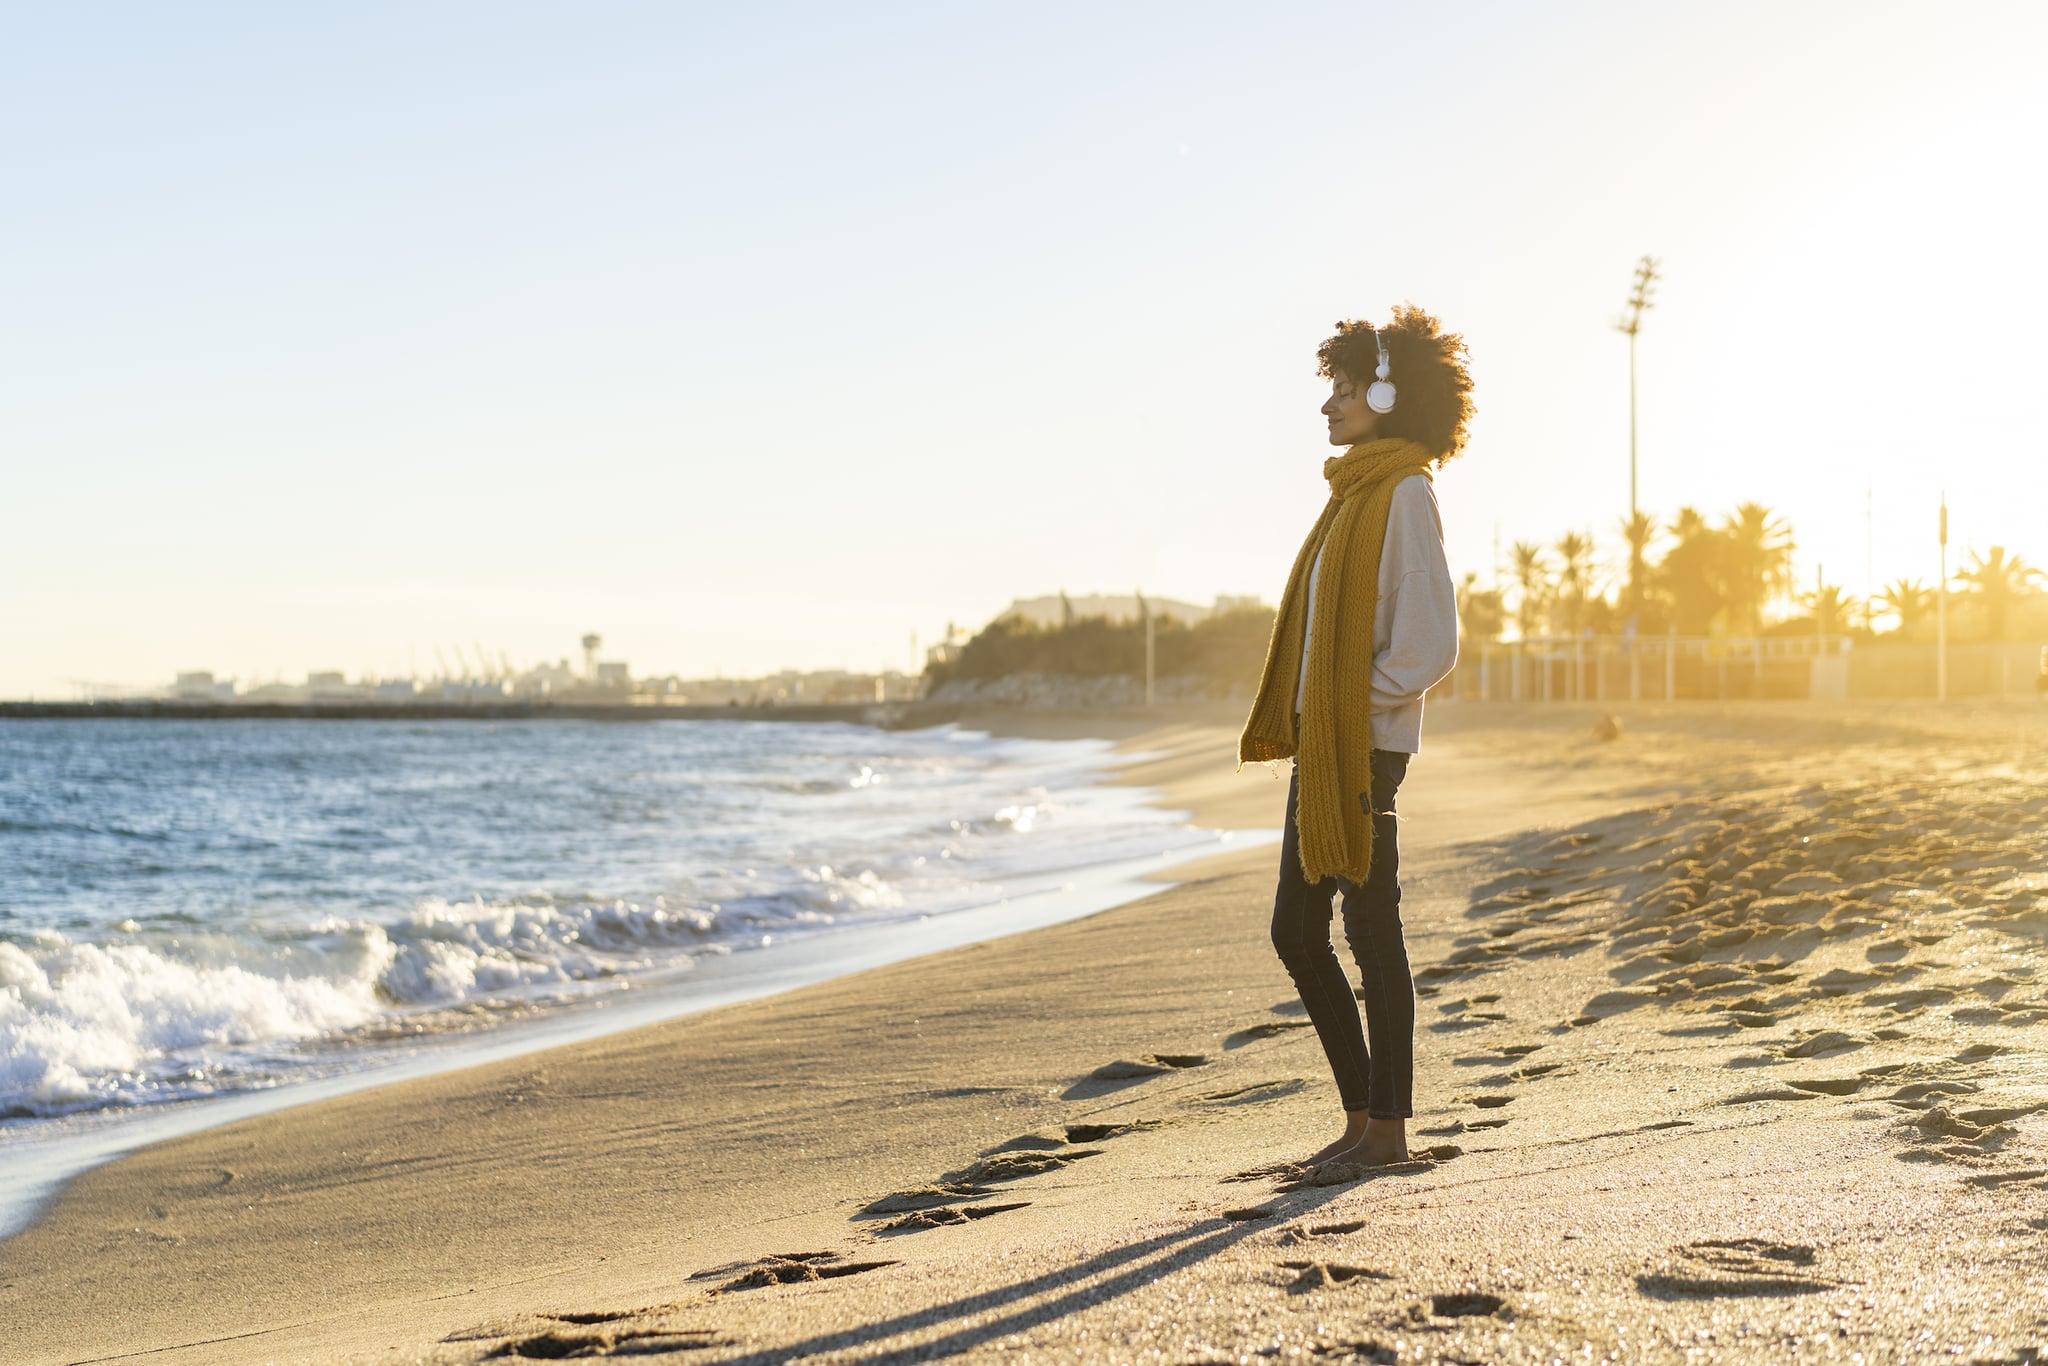 Woman at the beach, wearing headphones, listening music